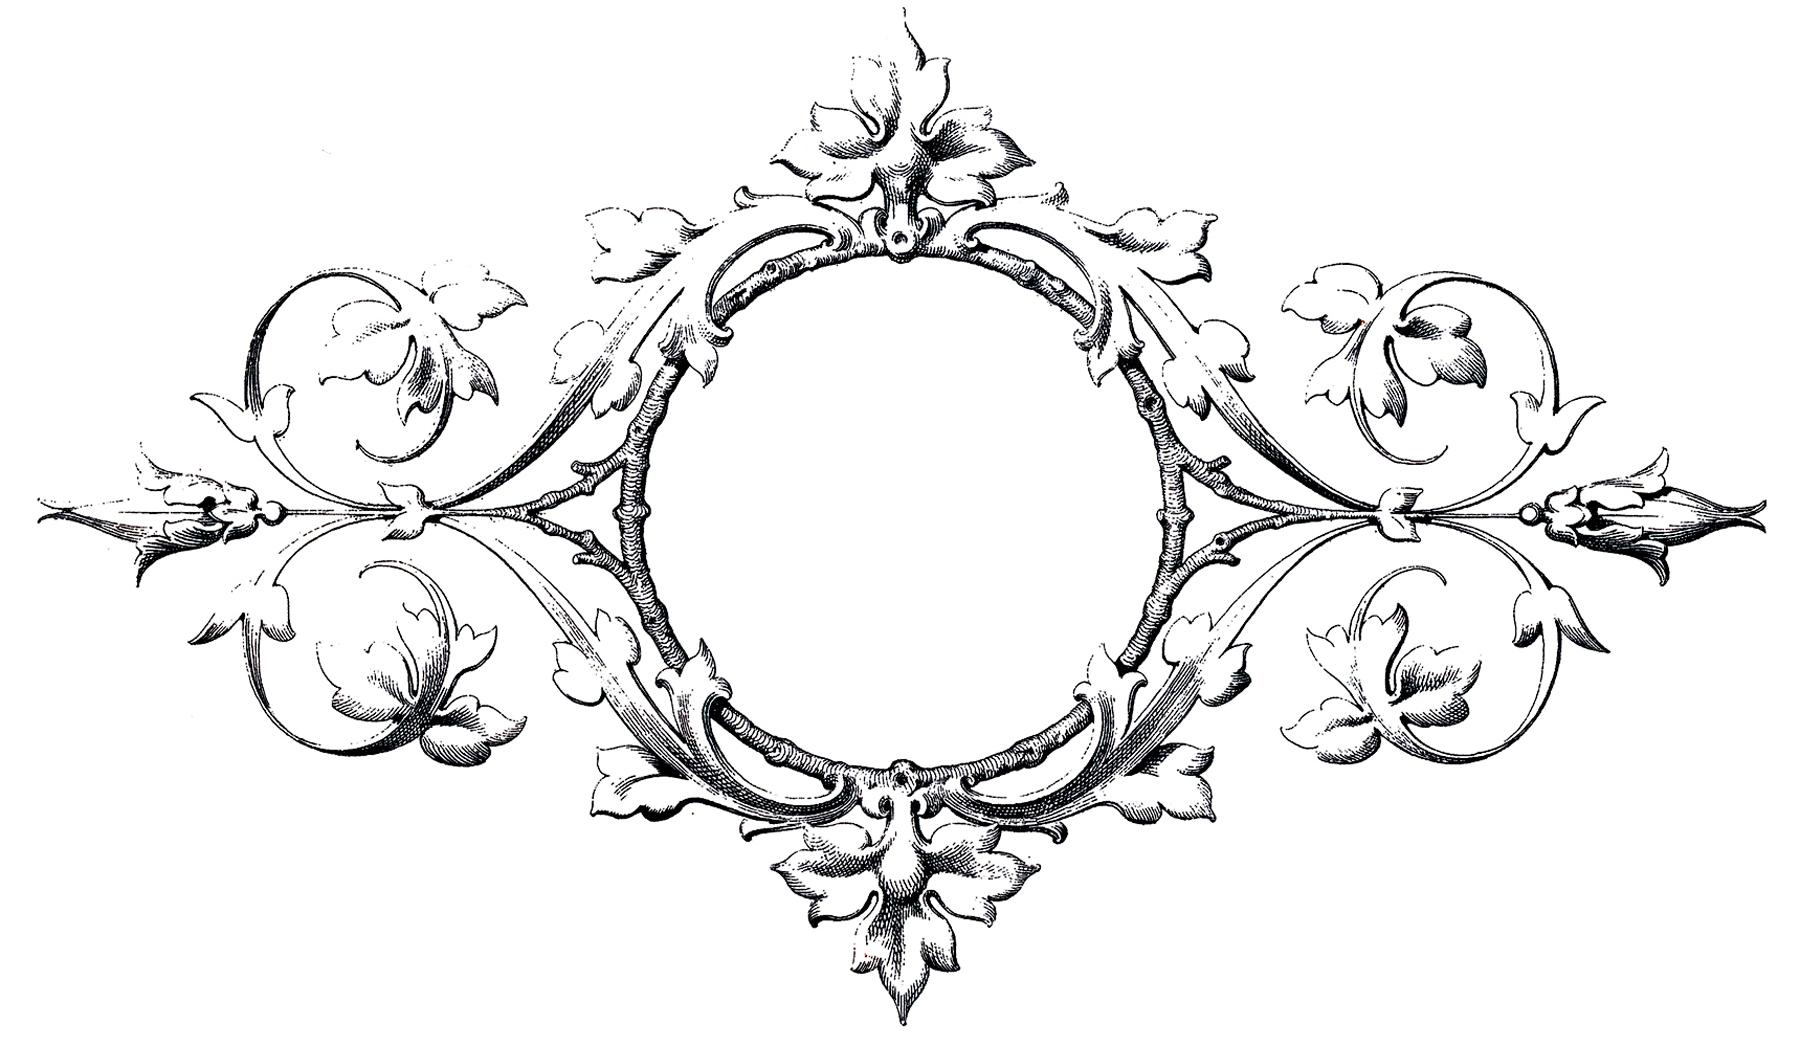 Stunning Scrolls Frame Image! - The Graphics Fairy